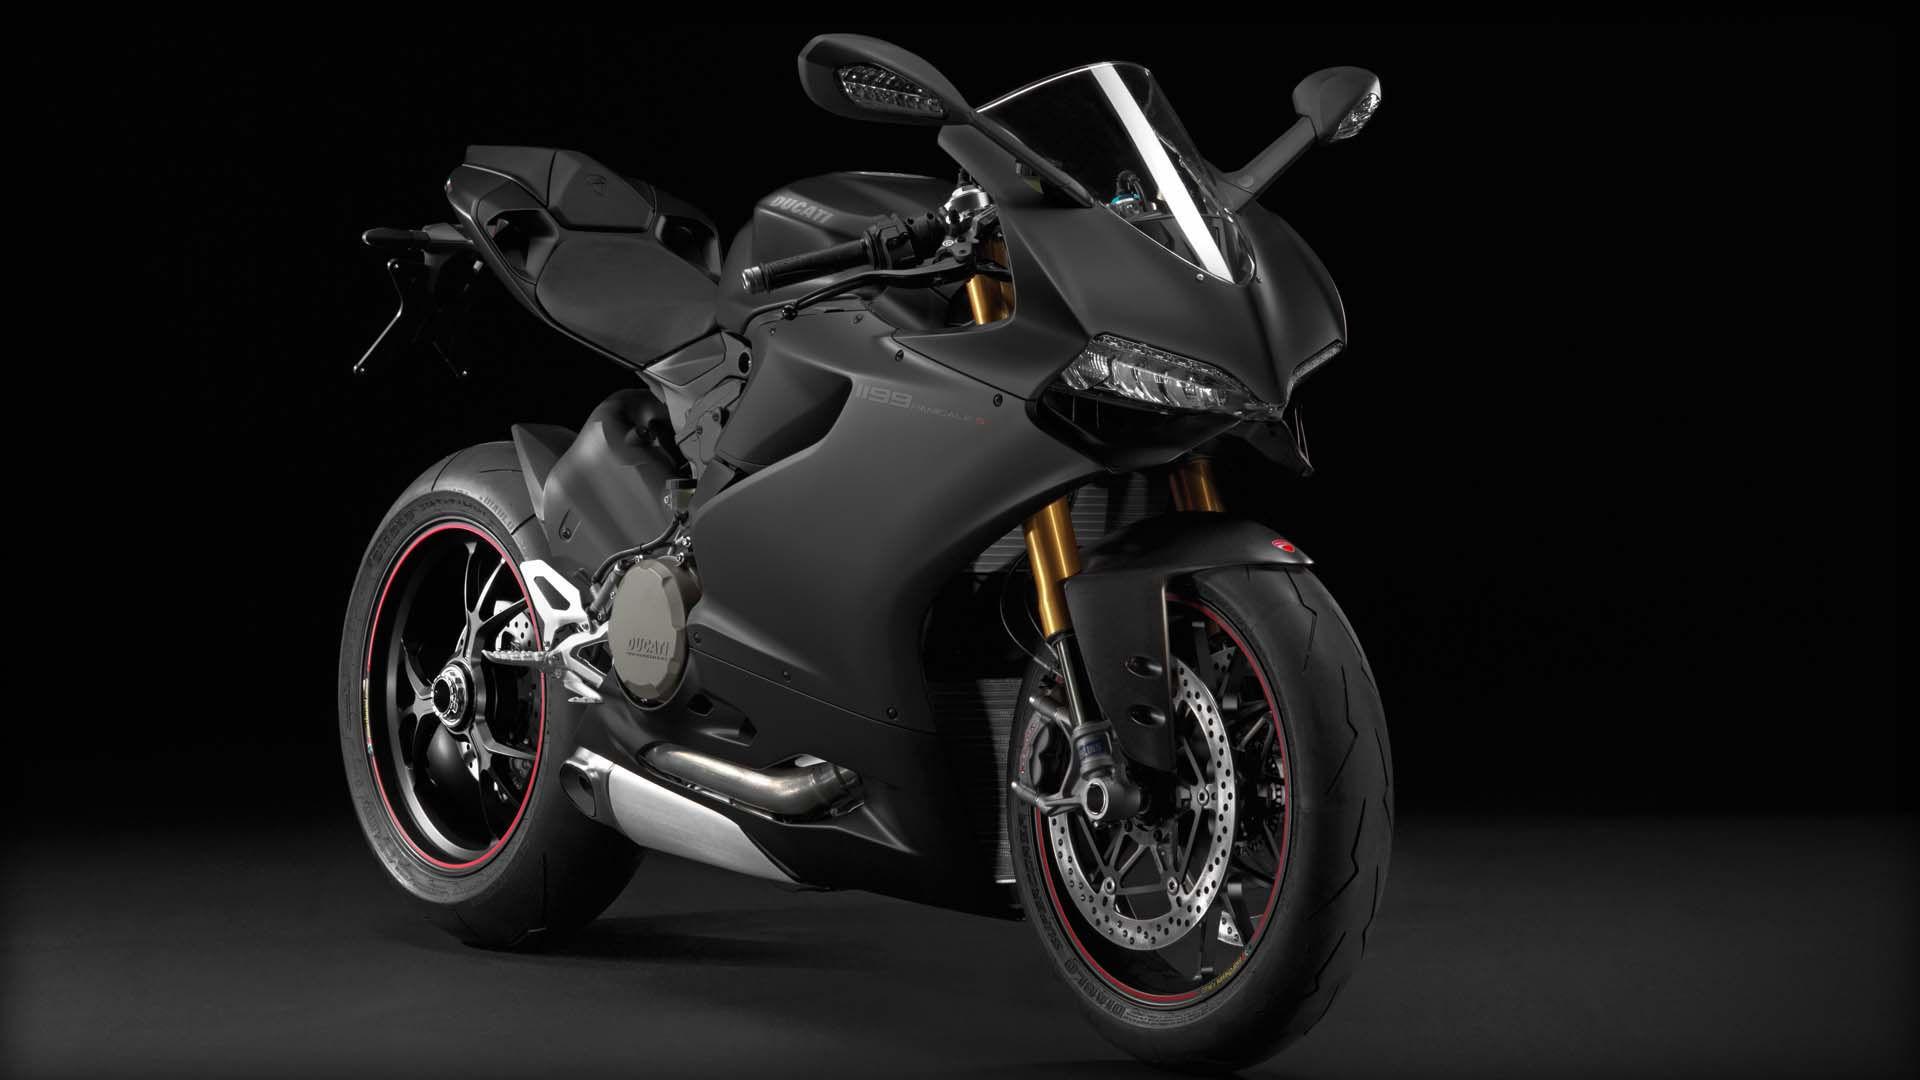 2014 Ducati 1199 PANIGALE S | Ducati 1199 Panigale S - Black Model